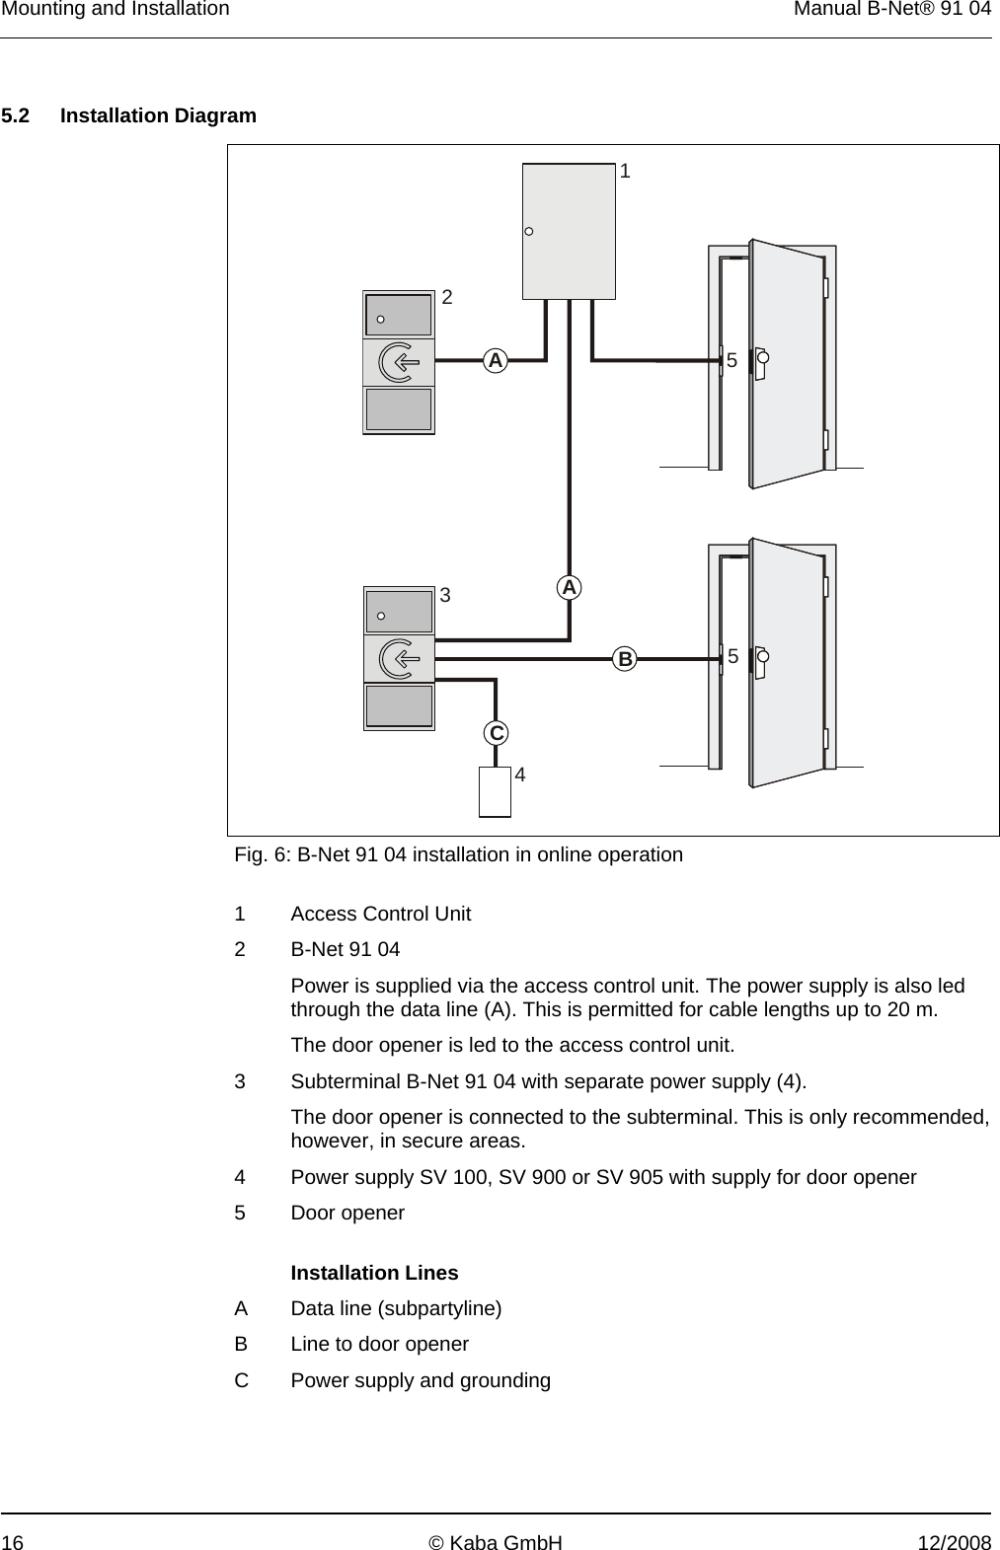 medium resolution of dormakaba ead bnet9104 inductive tag reader user manual docuglobe f r handb cher